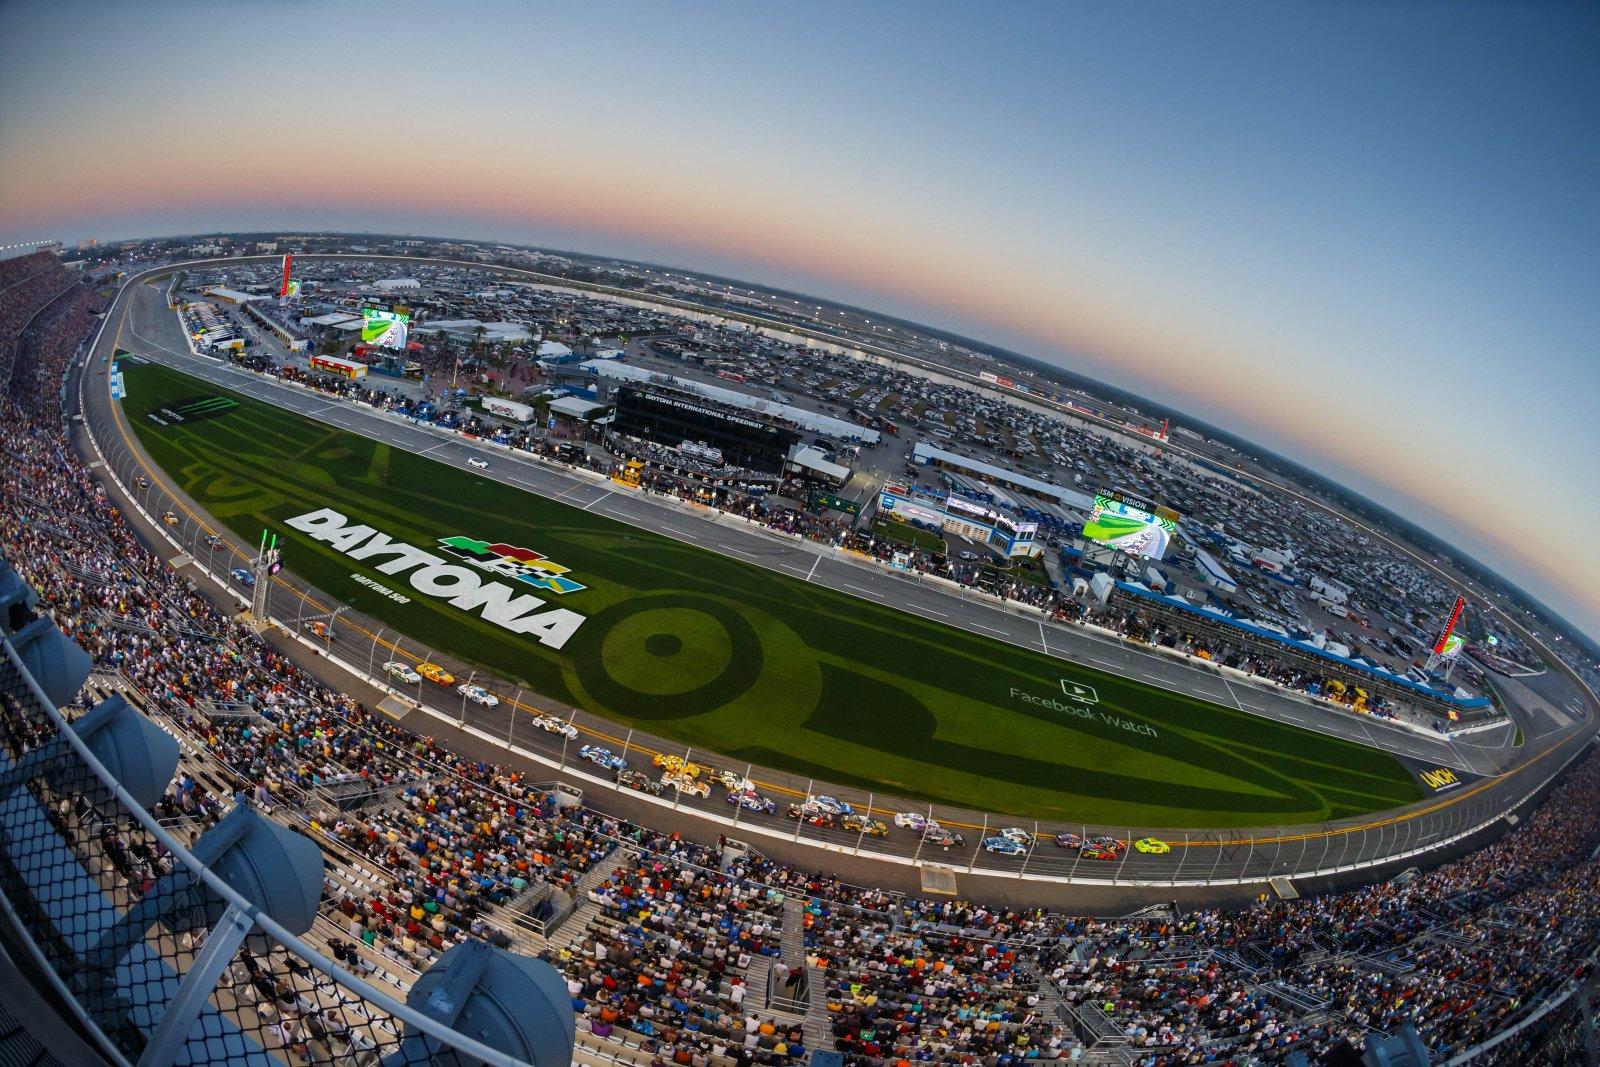 View of the Nascar track at the Daytona 500